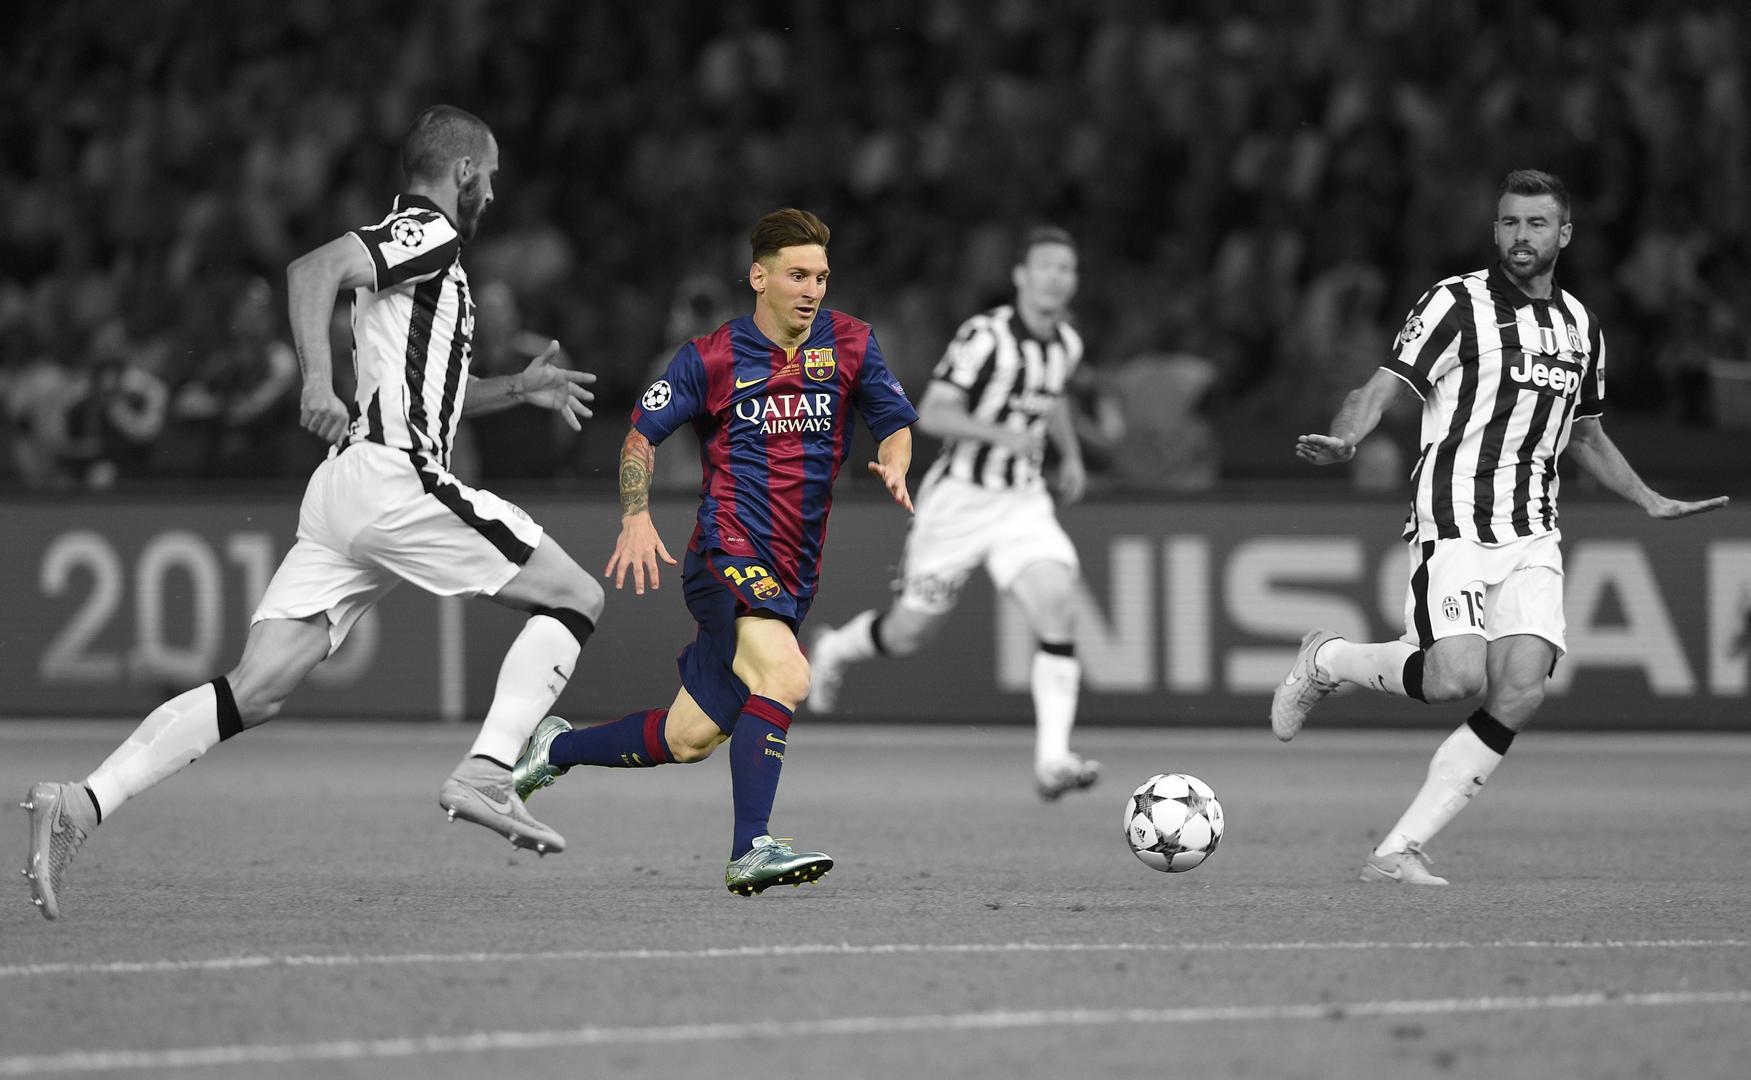 Hintergrundbilder : Sport, einfarbig, Selektive Färbung, Mannschaft ...